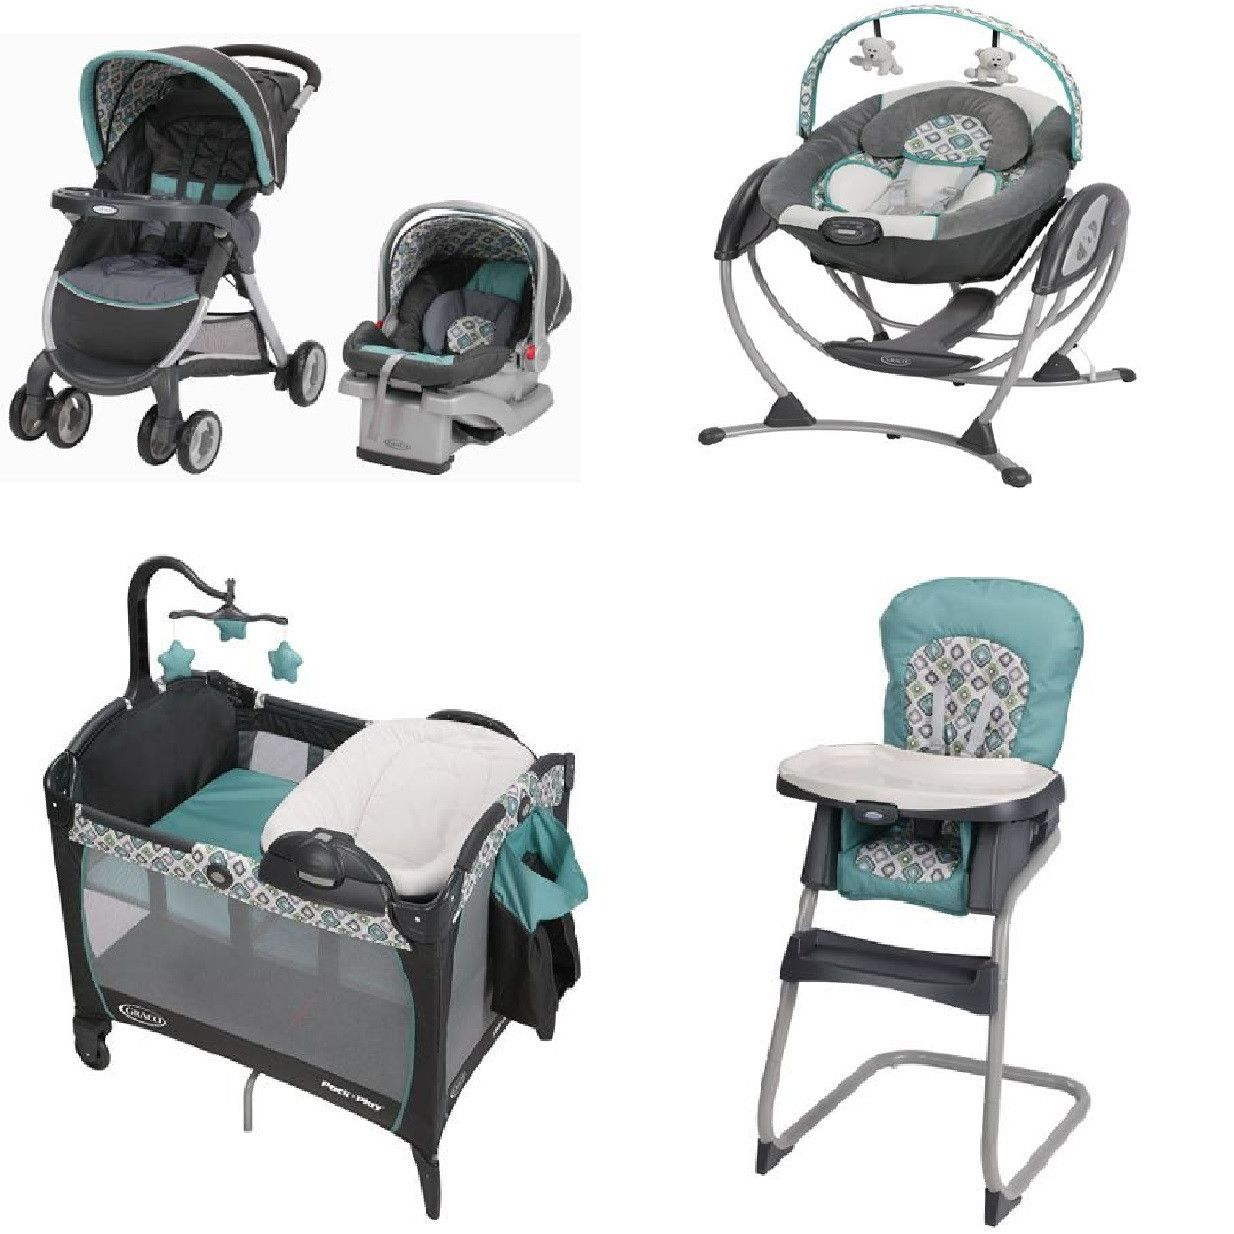 Graco Blue Baby Gear Bundle, Stroller Travel System, Play